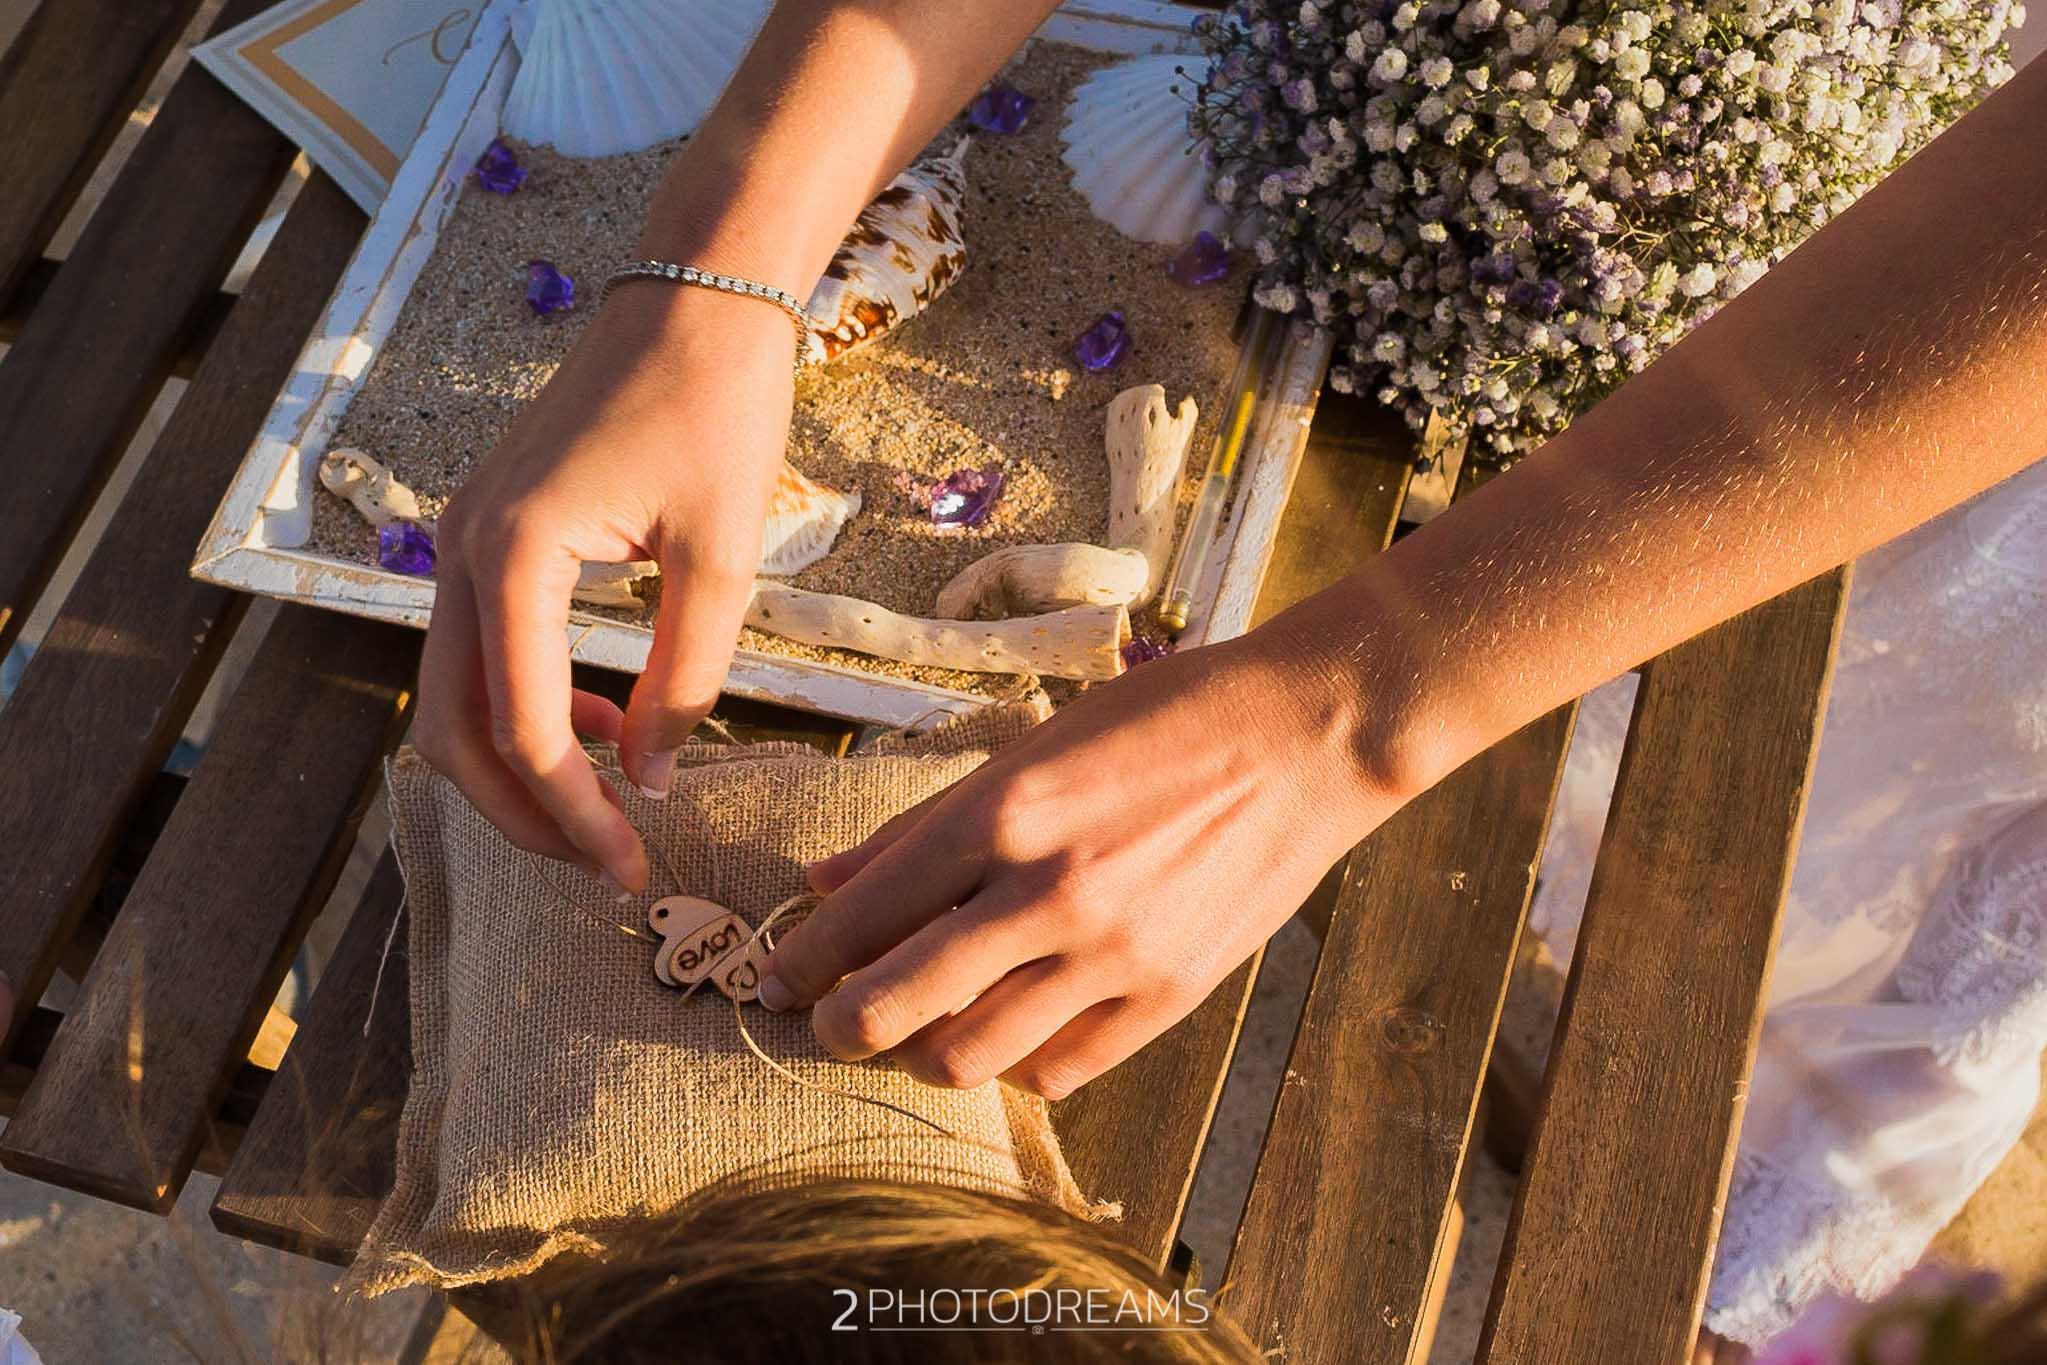 Wedding photographer Lincs Lincolnshire photo wedding